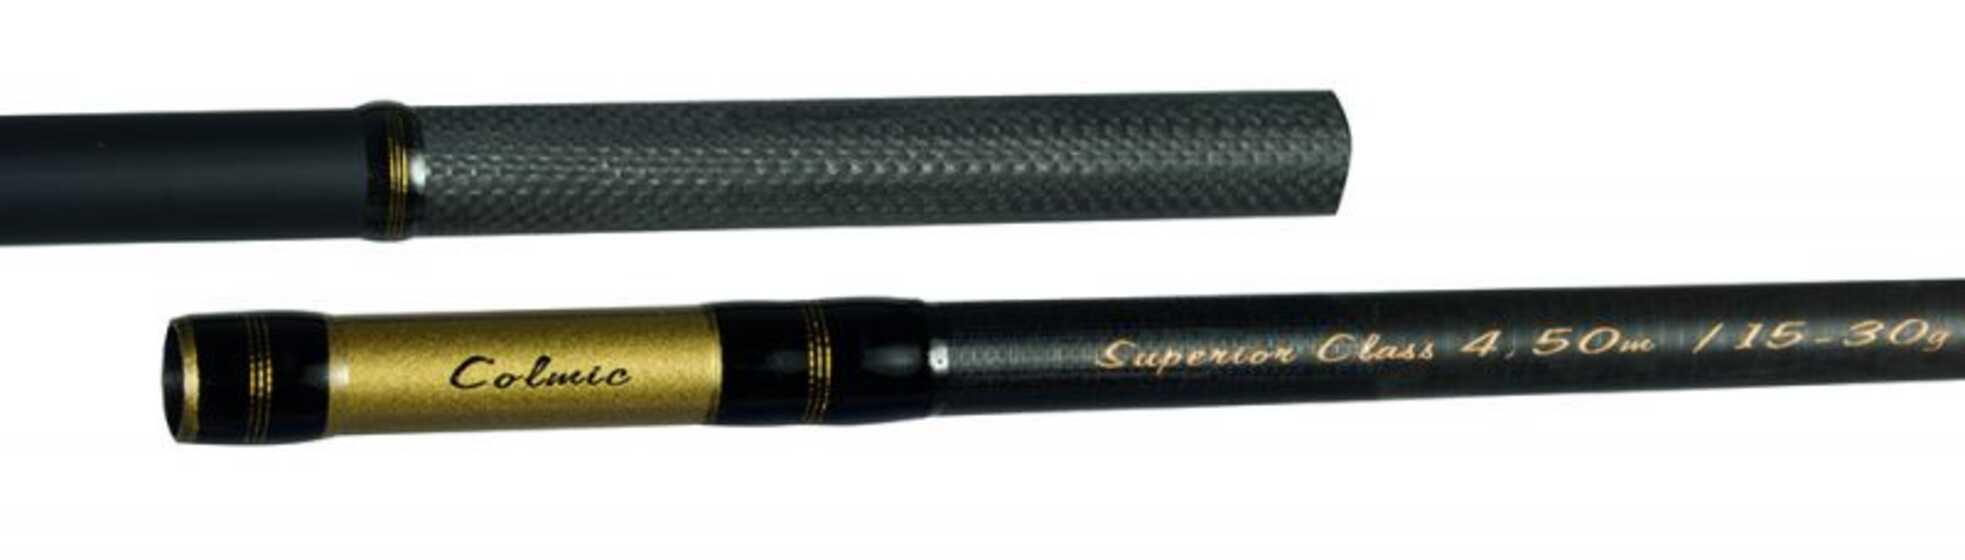 Colmic Superior Class 15-30 g